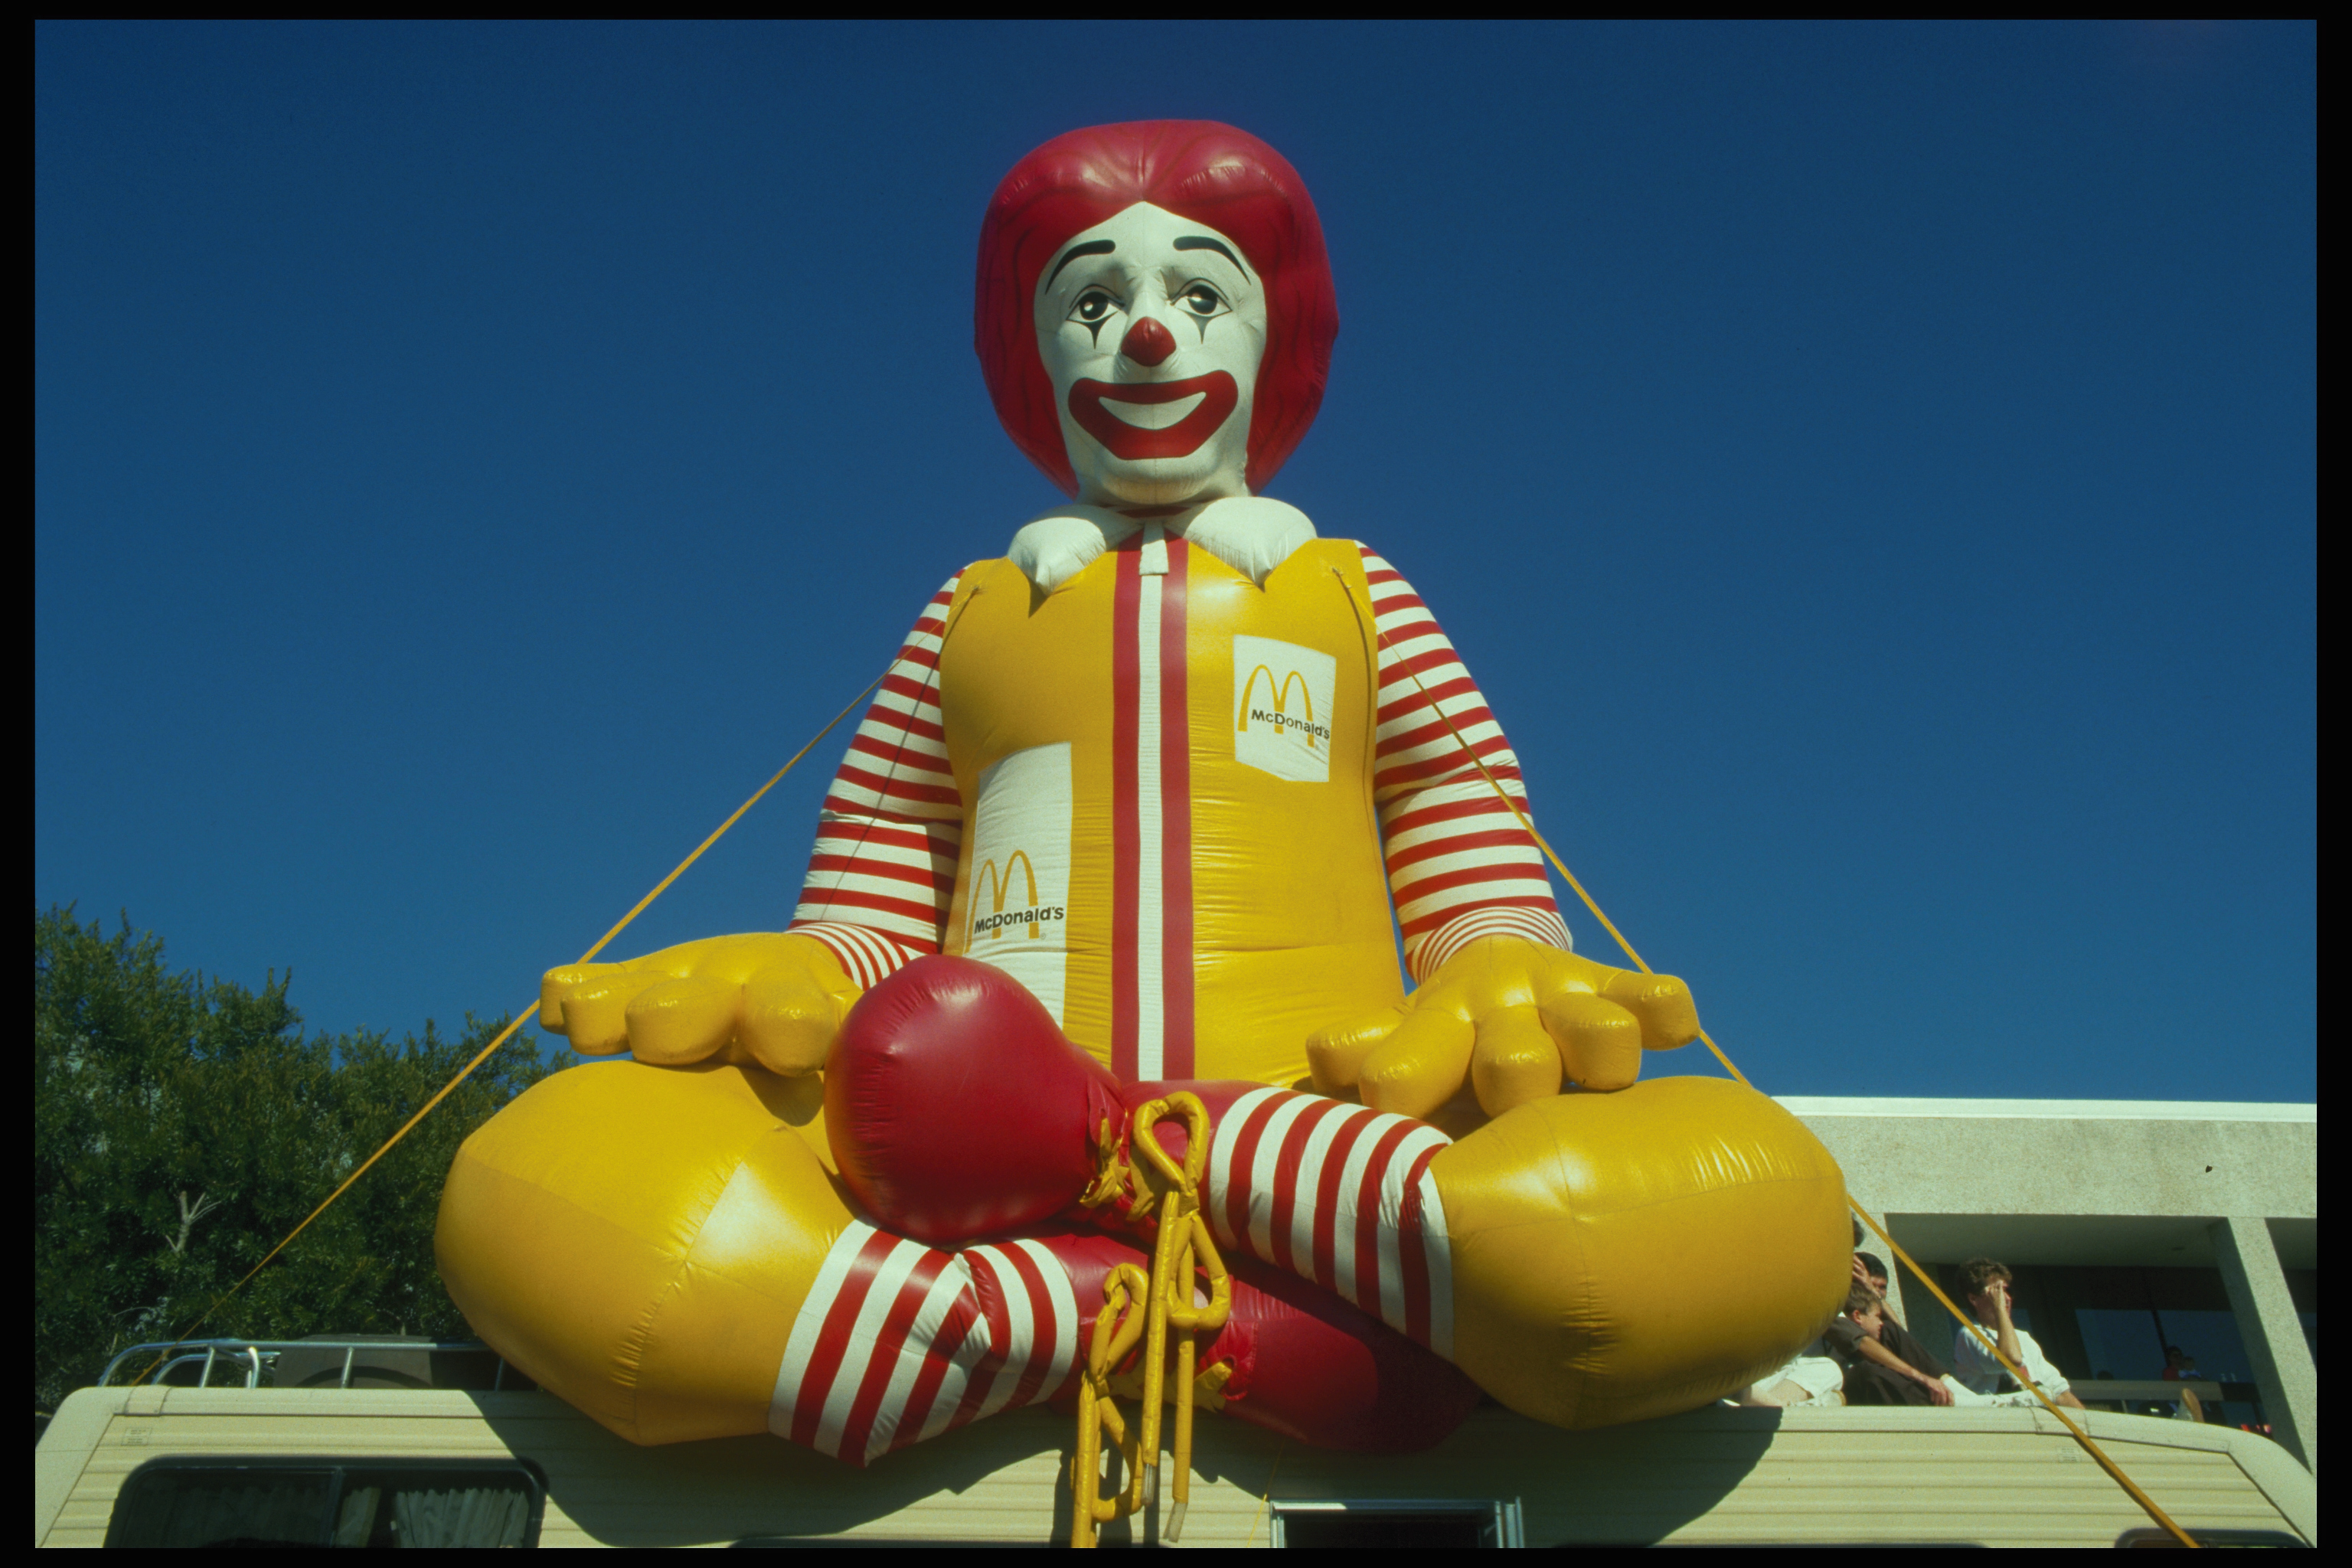 A large inflated Ronald McDonald at the Rice Festival, Louisiana.